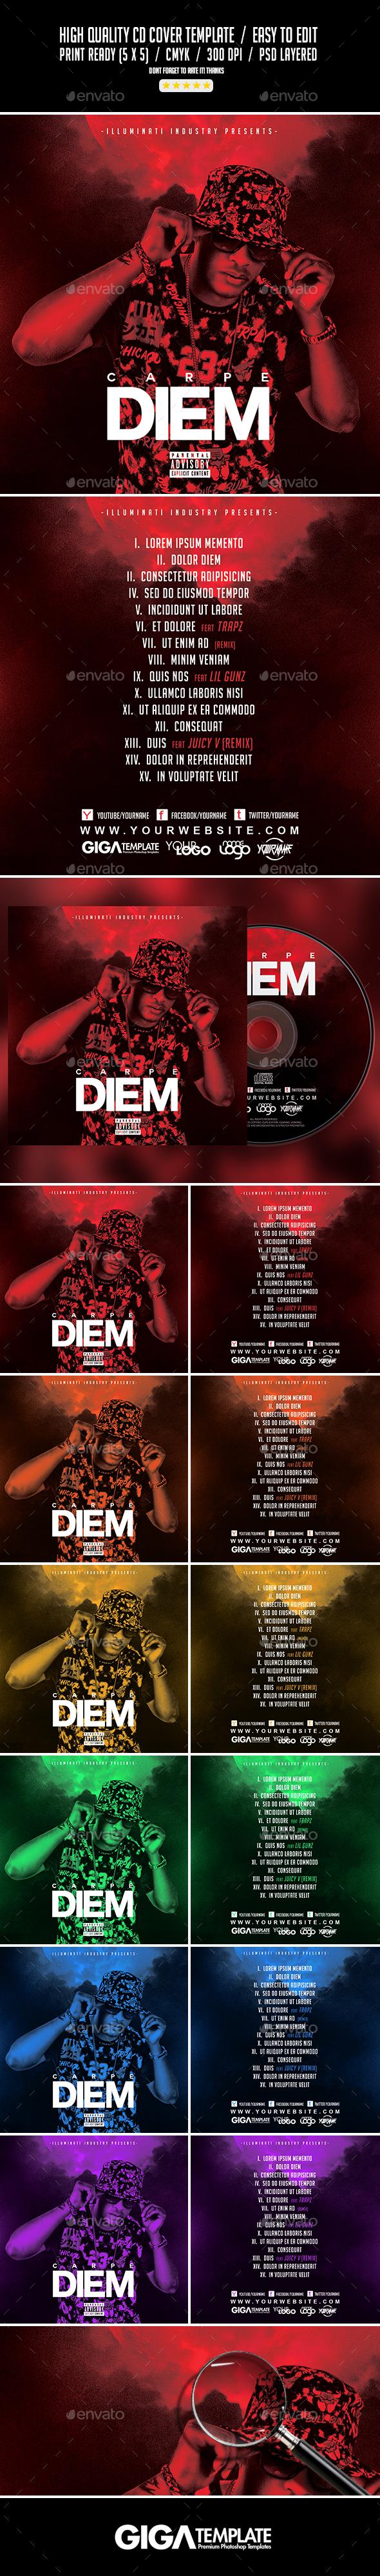 Carpe Diem | Dark Mixtape Album CD Cover Template - CD & DVD Artwork Print Templates